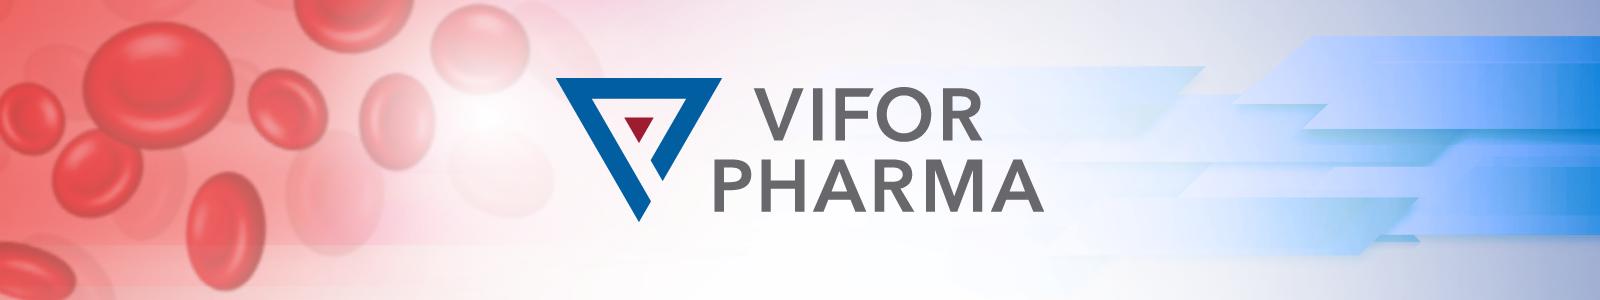 Diacordis2021-BANNER Vifor pharma